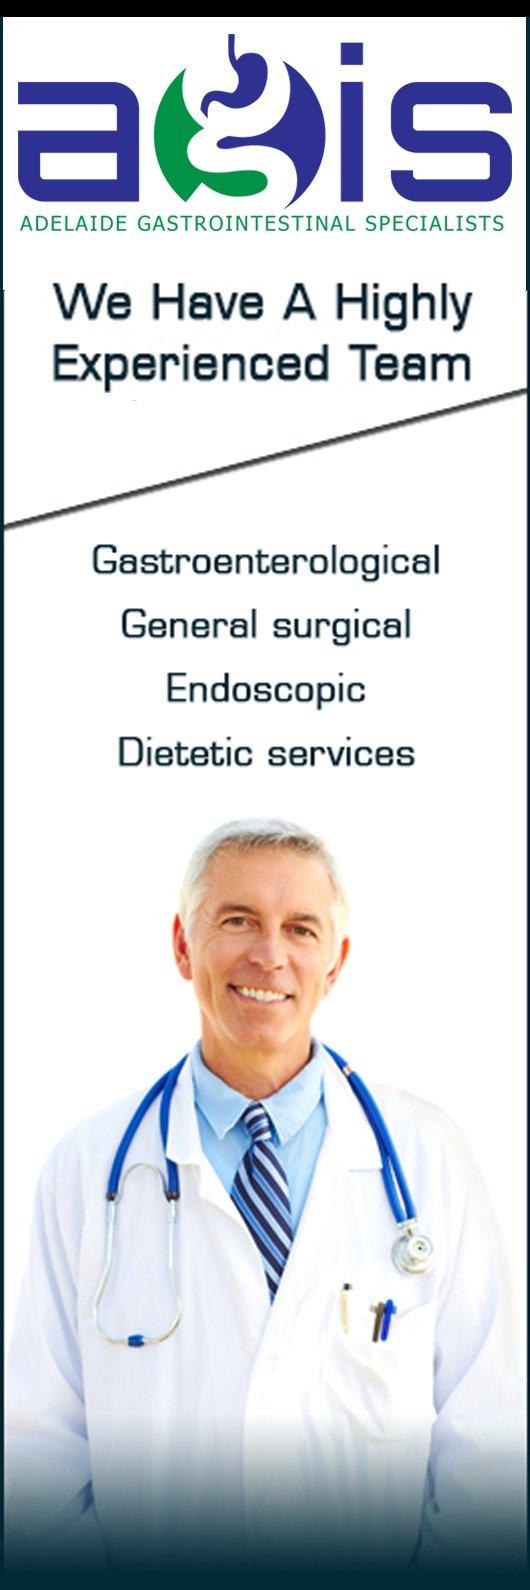 Adelaide Gastrointestinal Specialists - Gastroenterology